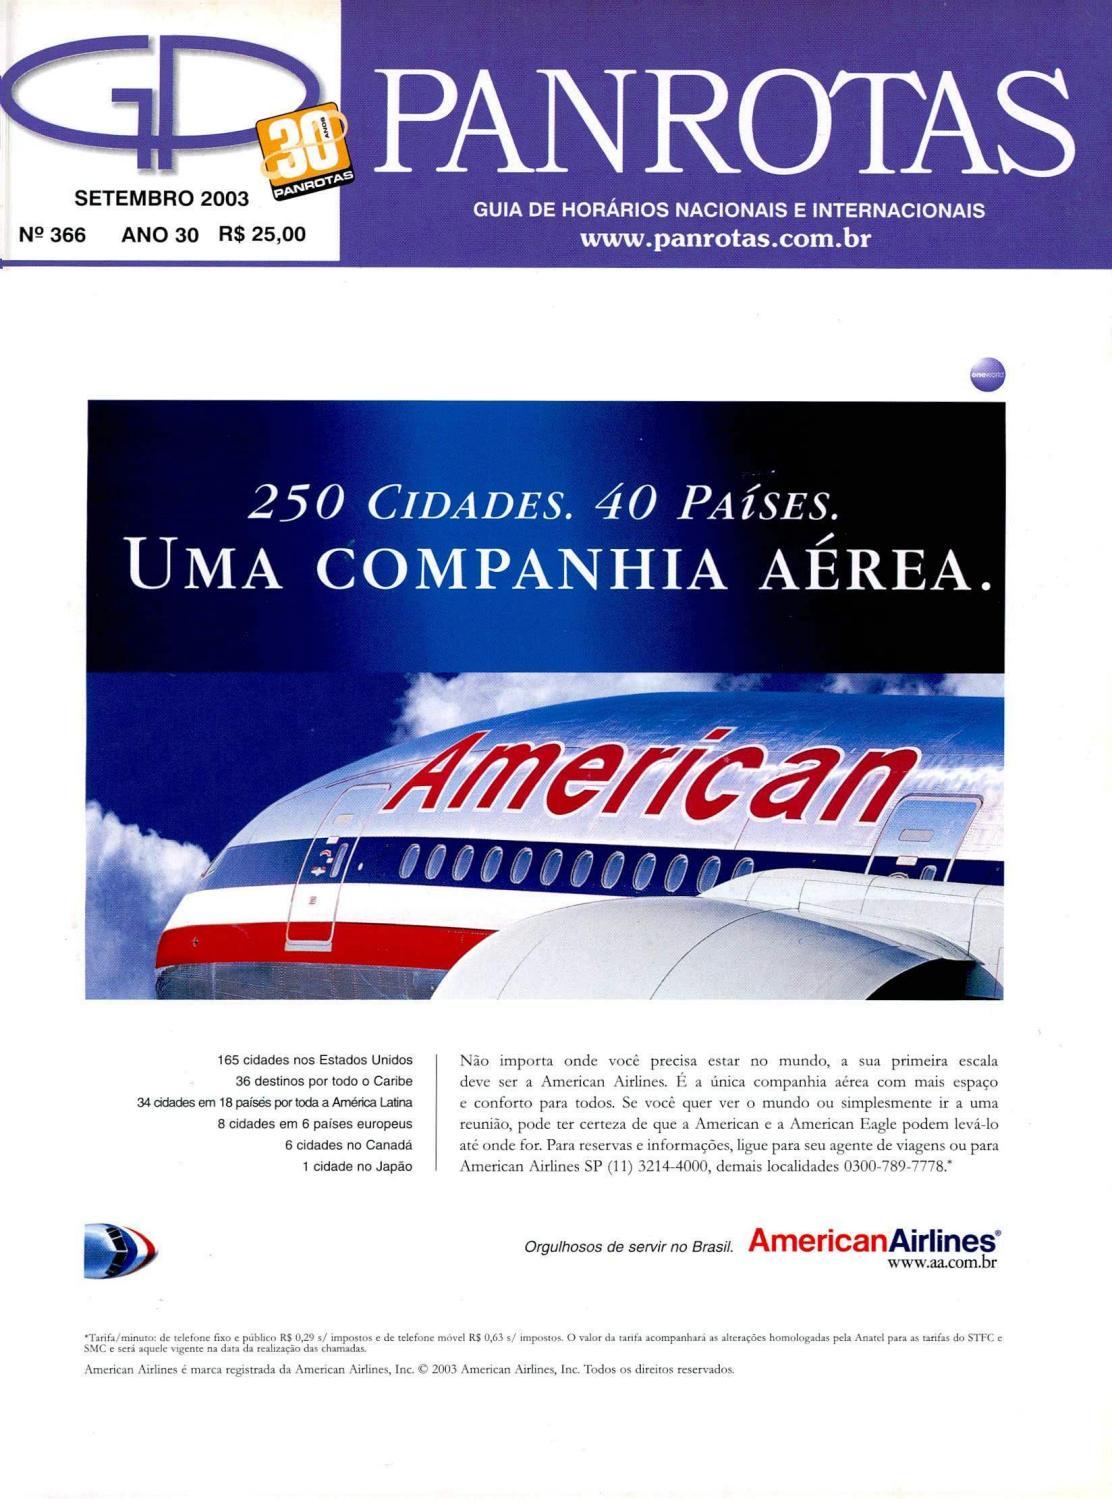 Guia PANROTAS - Edição 366 - Setembro 2003 by PANROTAS Editora - issuu 8597b52a447